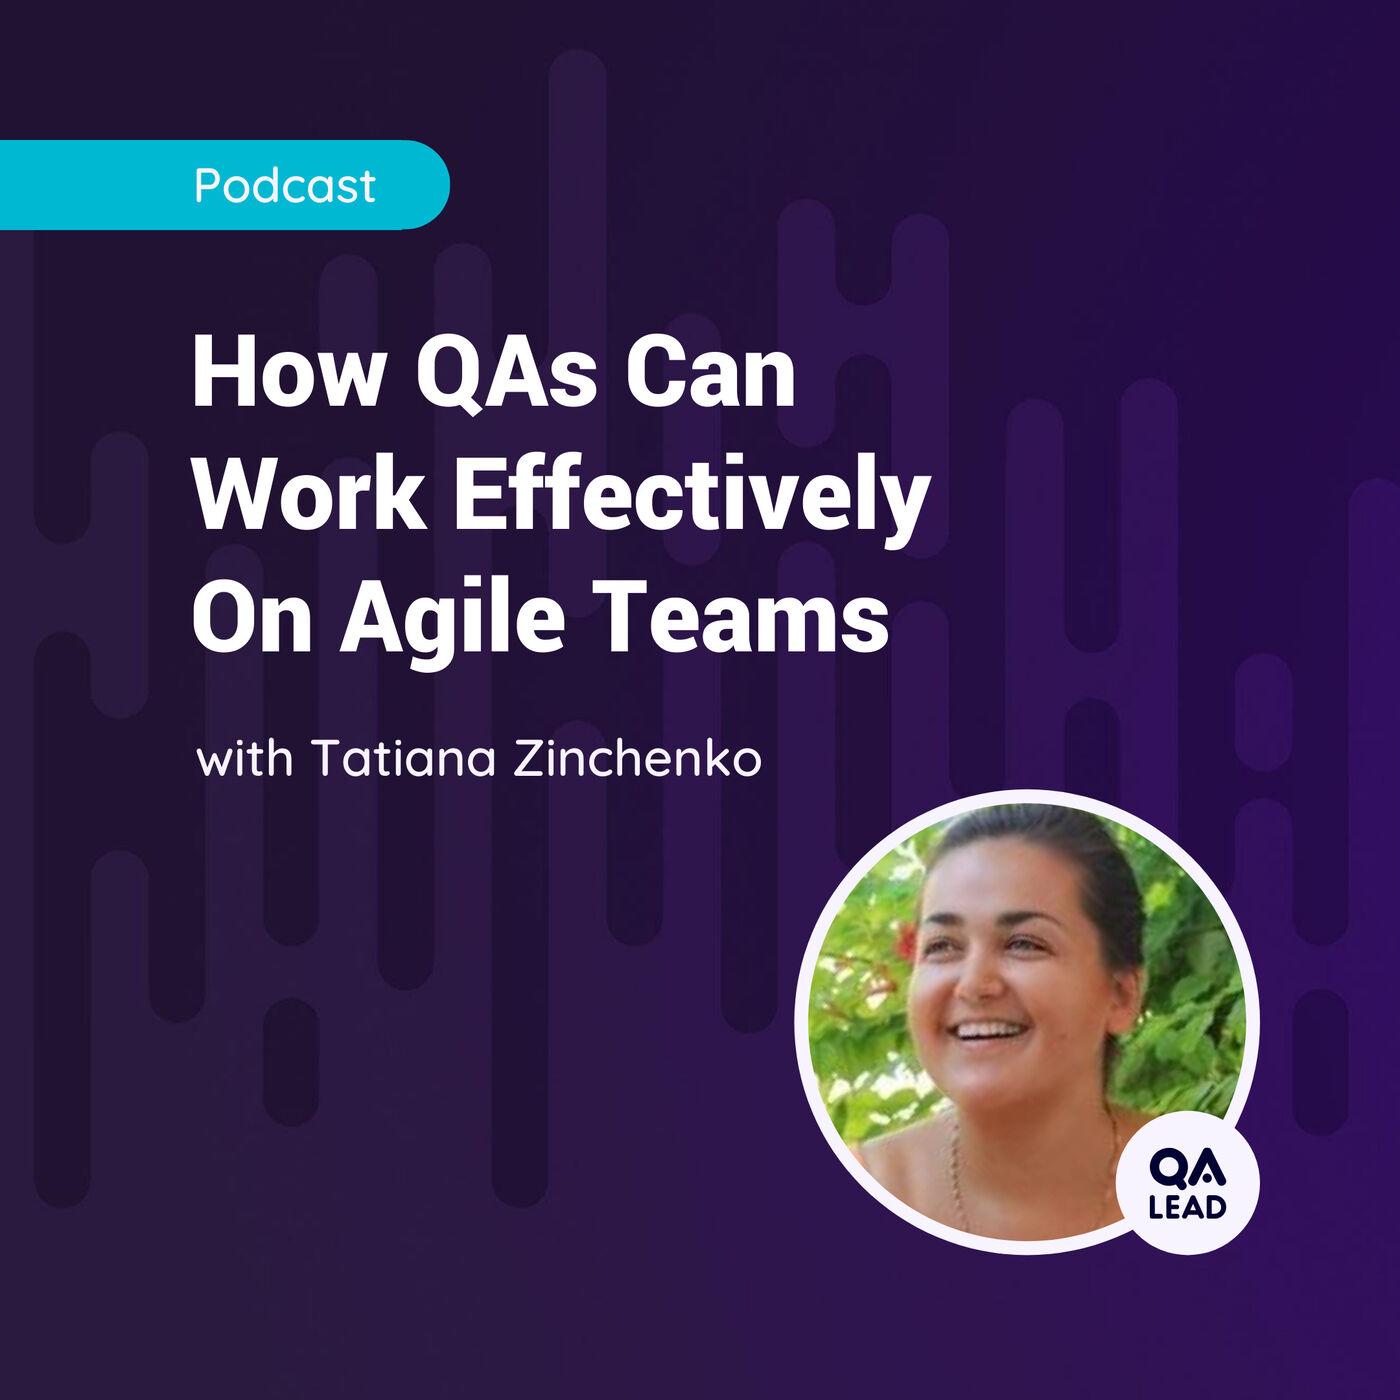 How QAs Can Work Effectively On Agile Teams (with Tatiana Zinchenko from AVEVA)